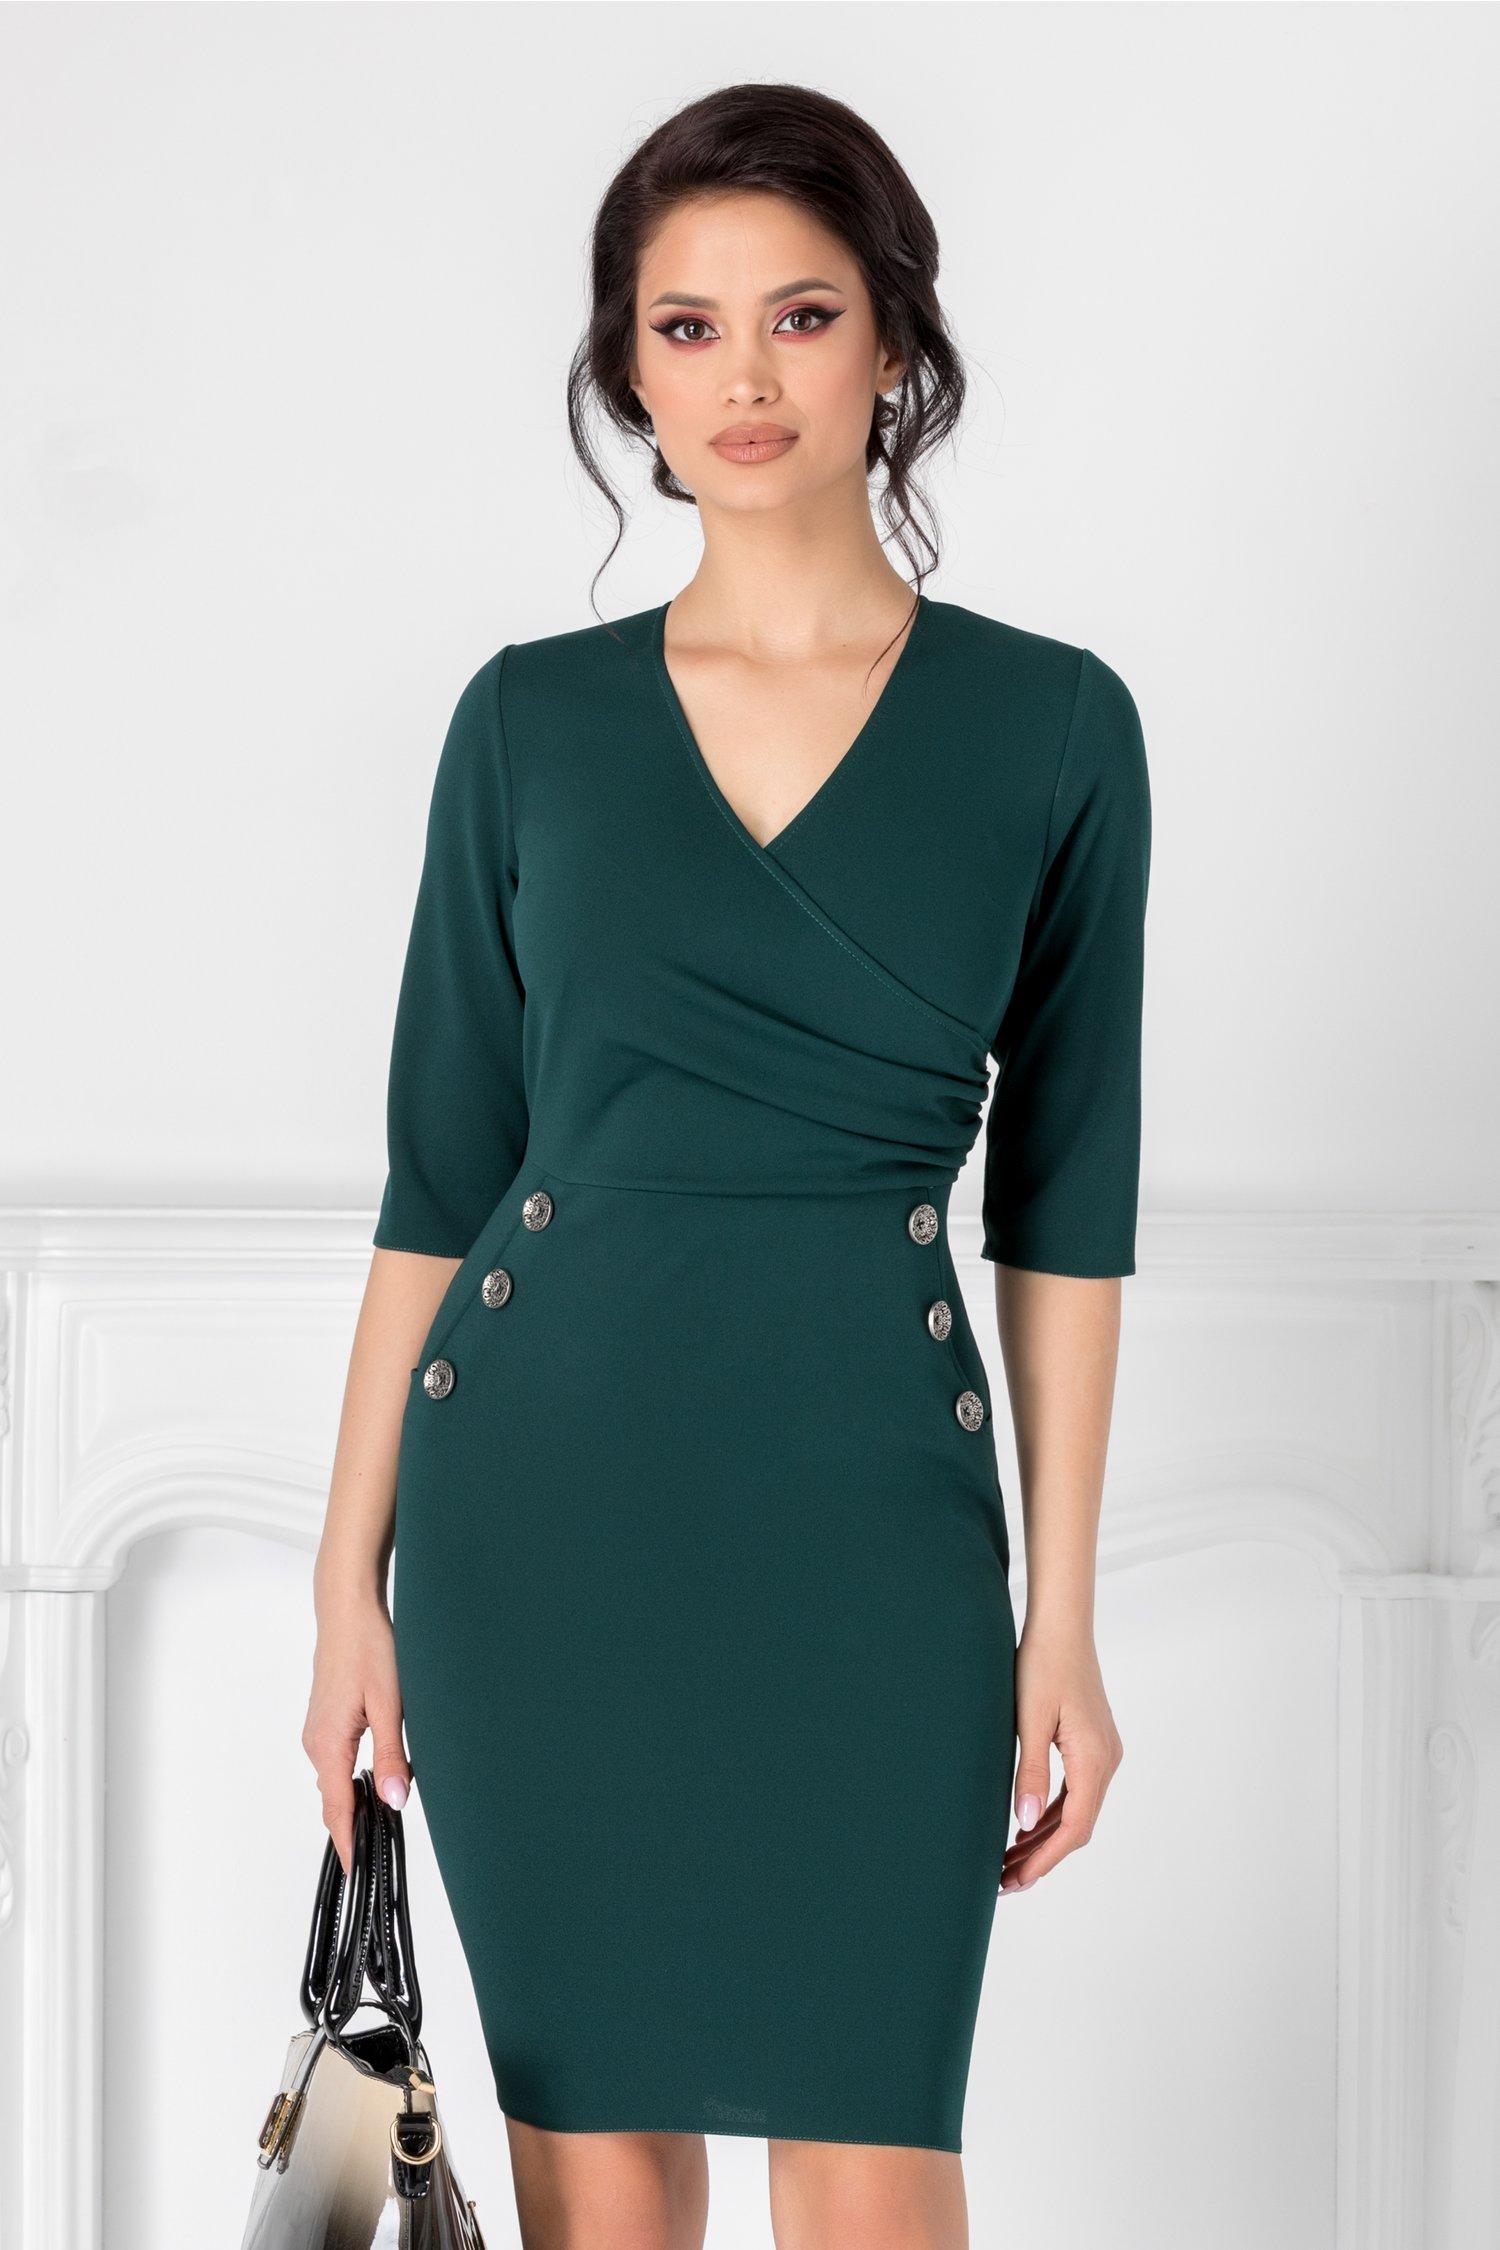 Rochie Emma verde petrol cu decolteu petrecut si nasturi decorativi